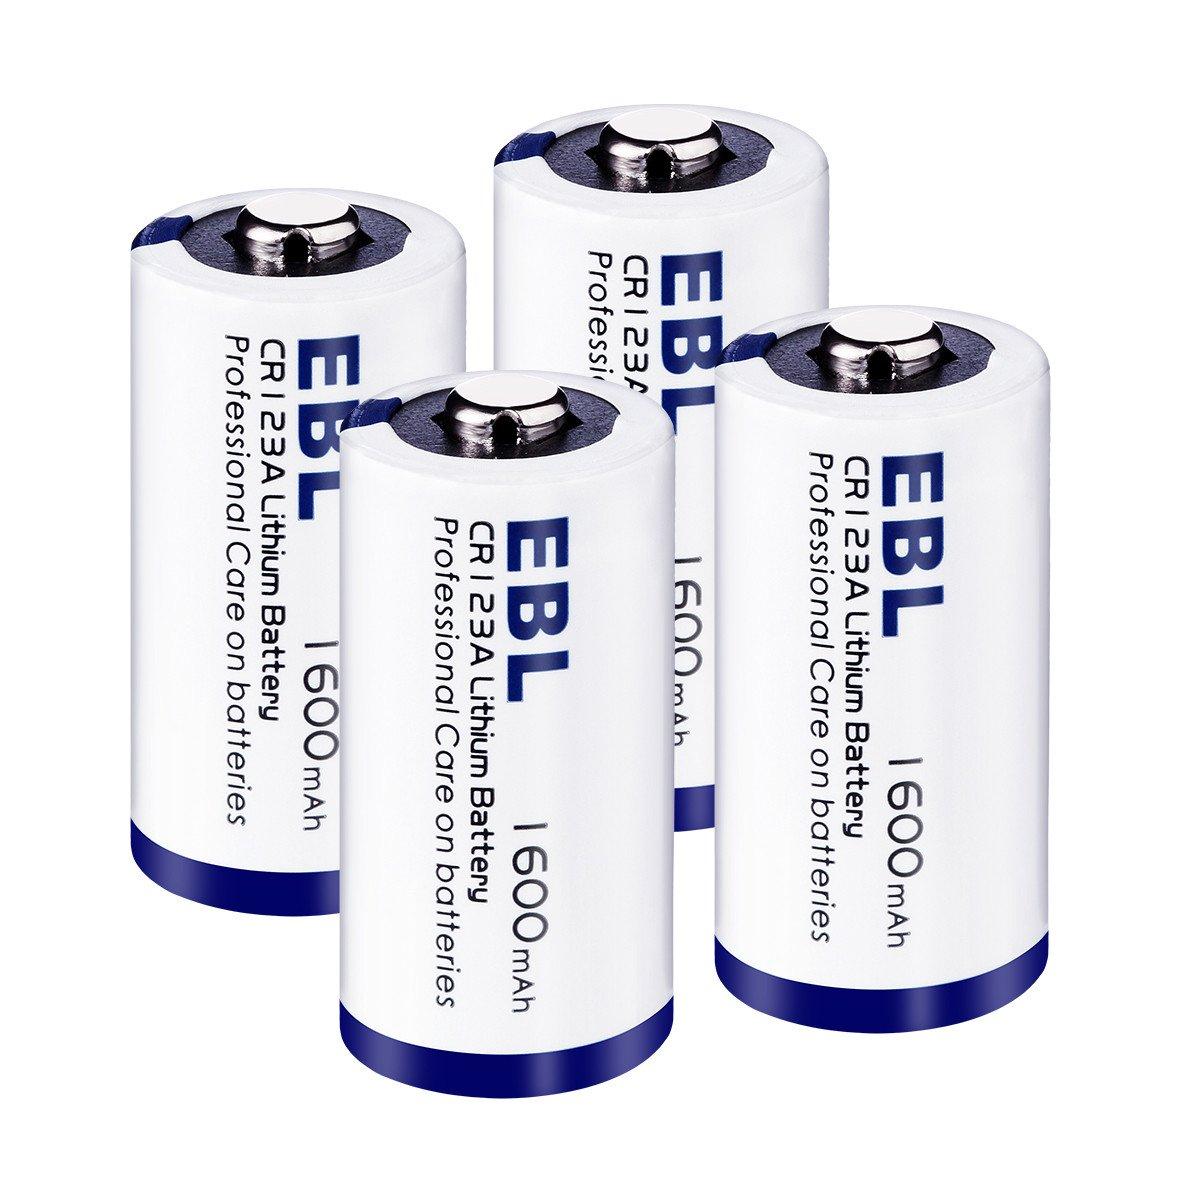 EBL CR123A 1600mAh Metal de Litio Batería CR123A 3V - para Linterna Cámara Digital Videocámara Juguetes Antorcha - 4 Unidades